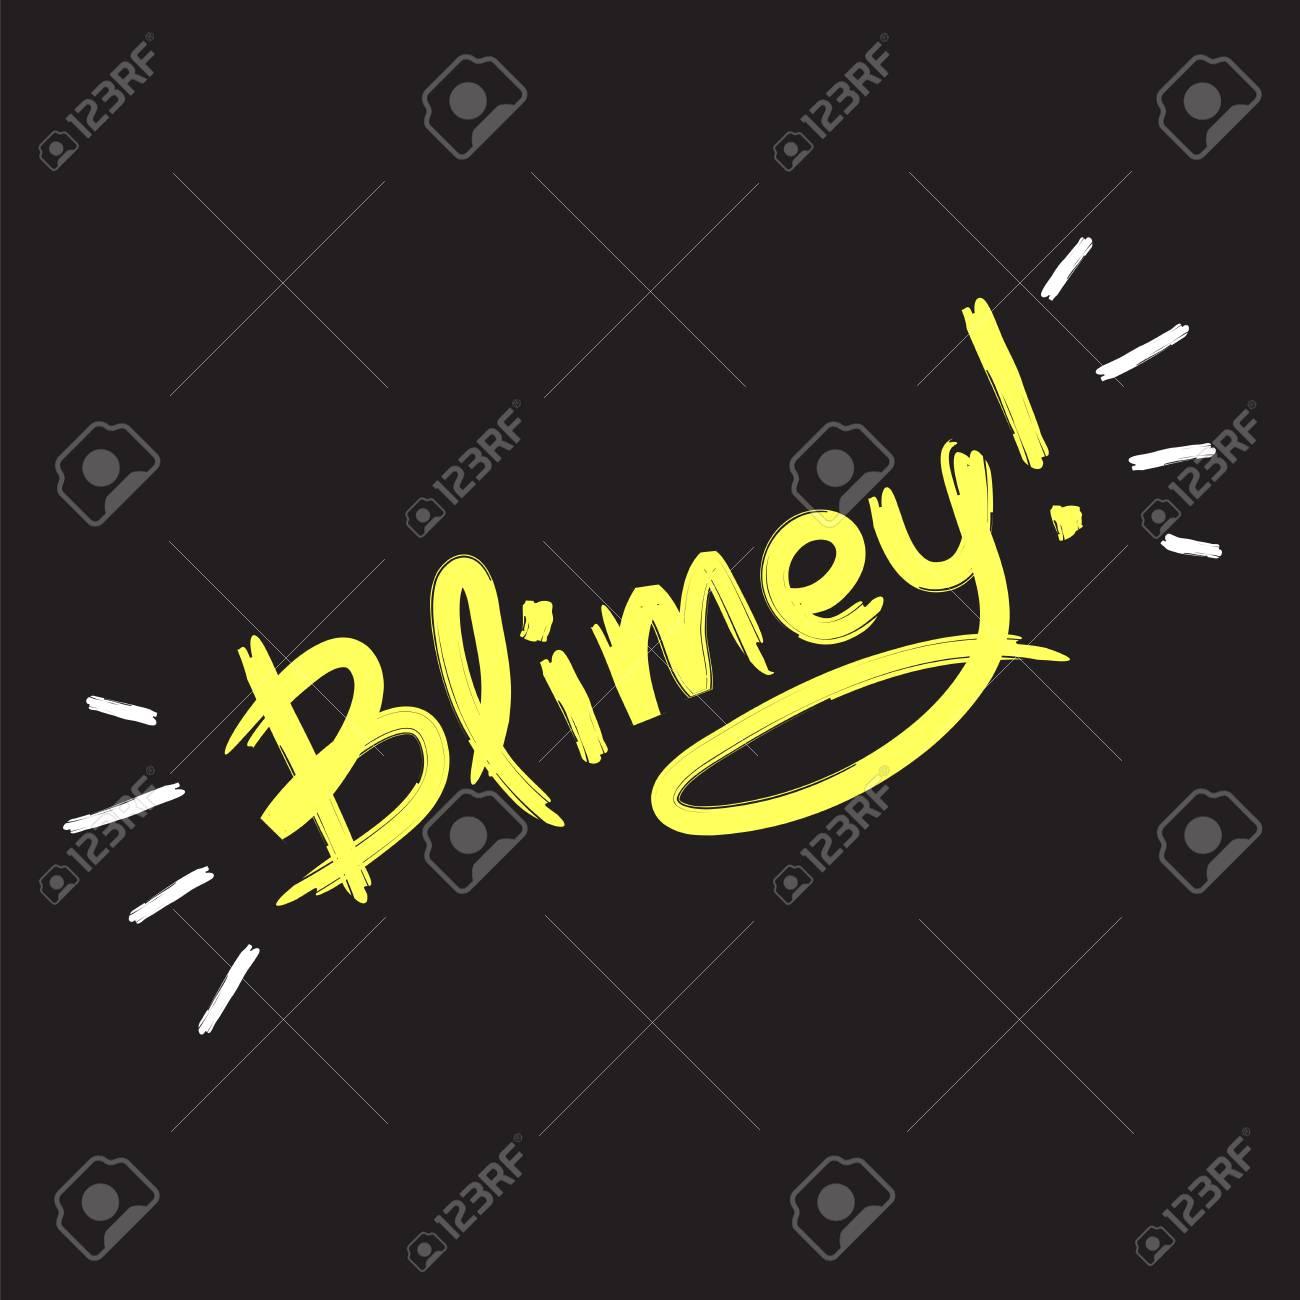 Blimey! - emotional handwritten quote. Print for poster, t-shirt, bag, logo, postcard, flyer, sticker, sweatshirt, cups. Exclamation, slang. Simple original vector - 101303291